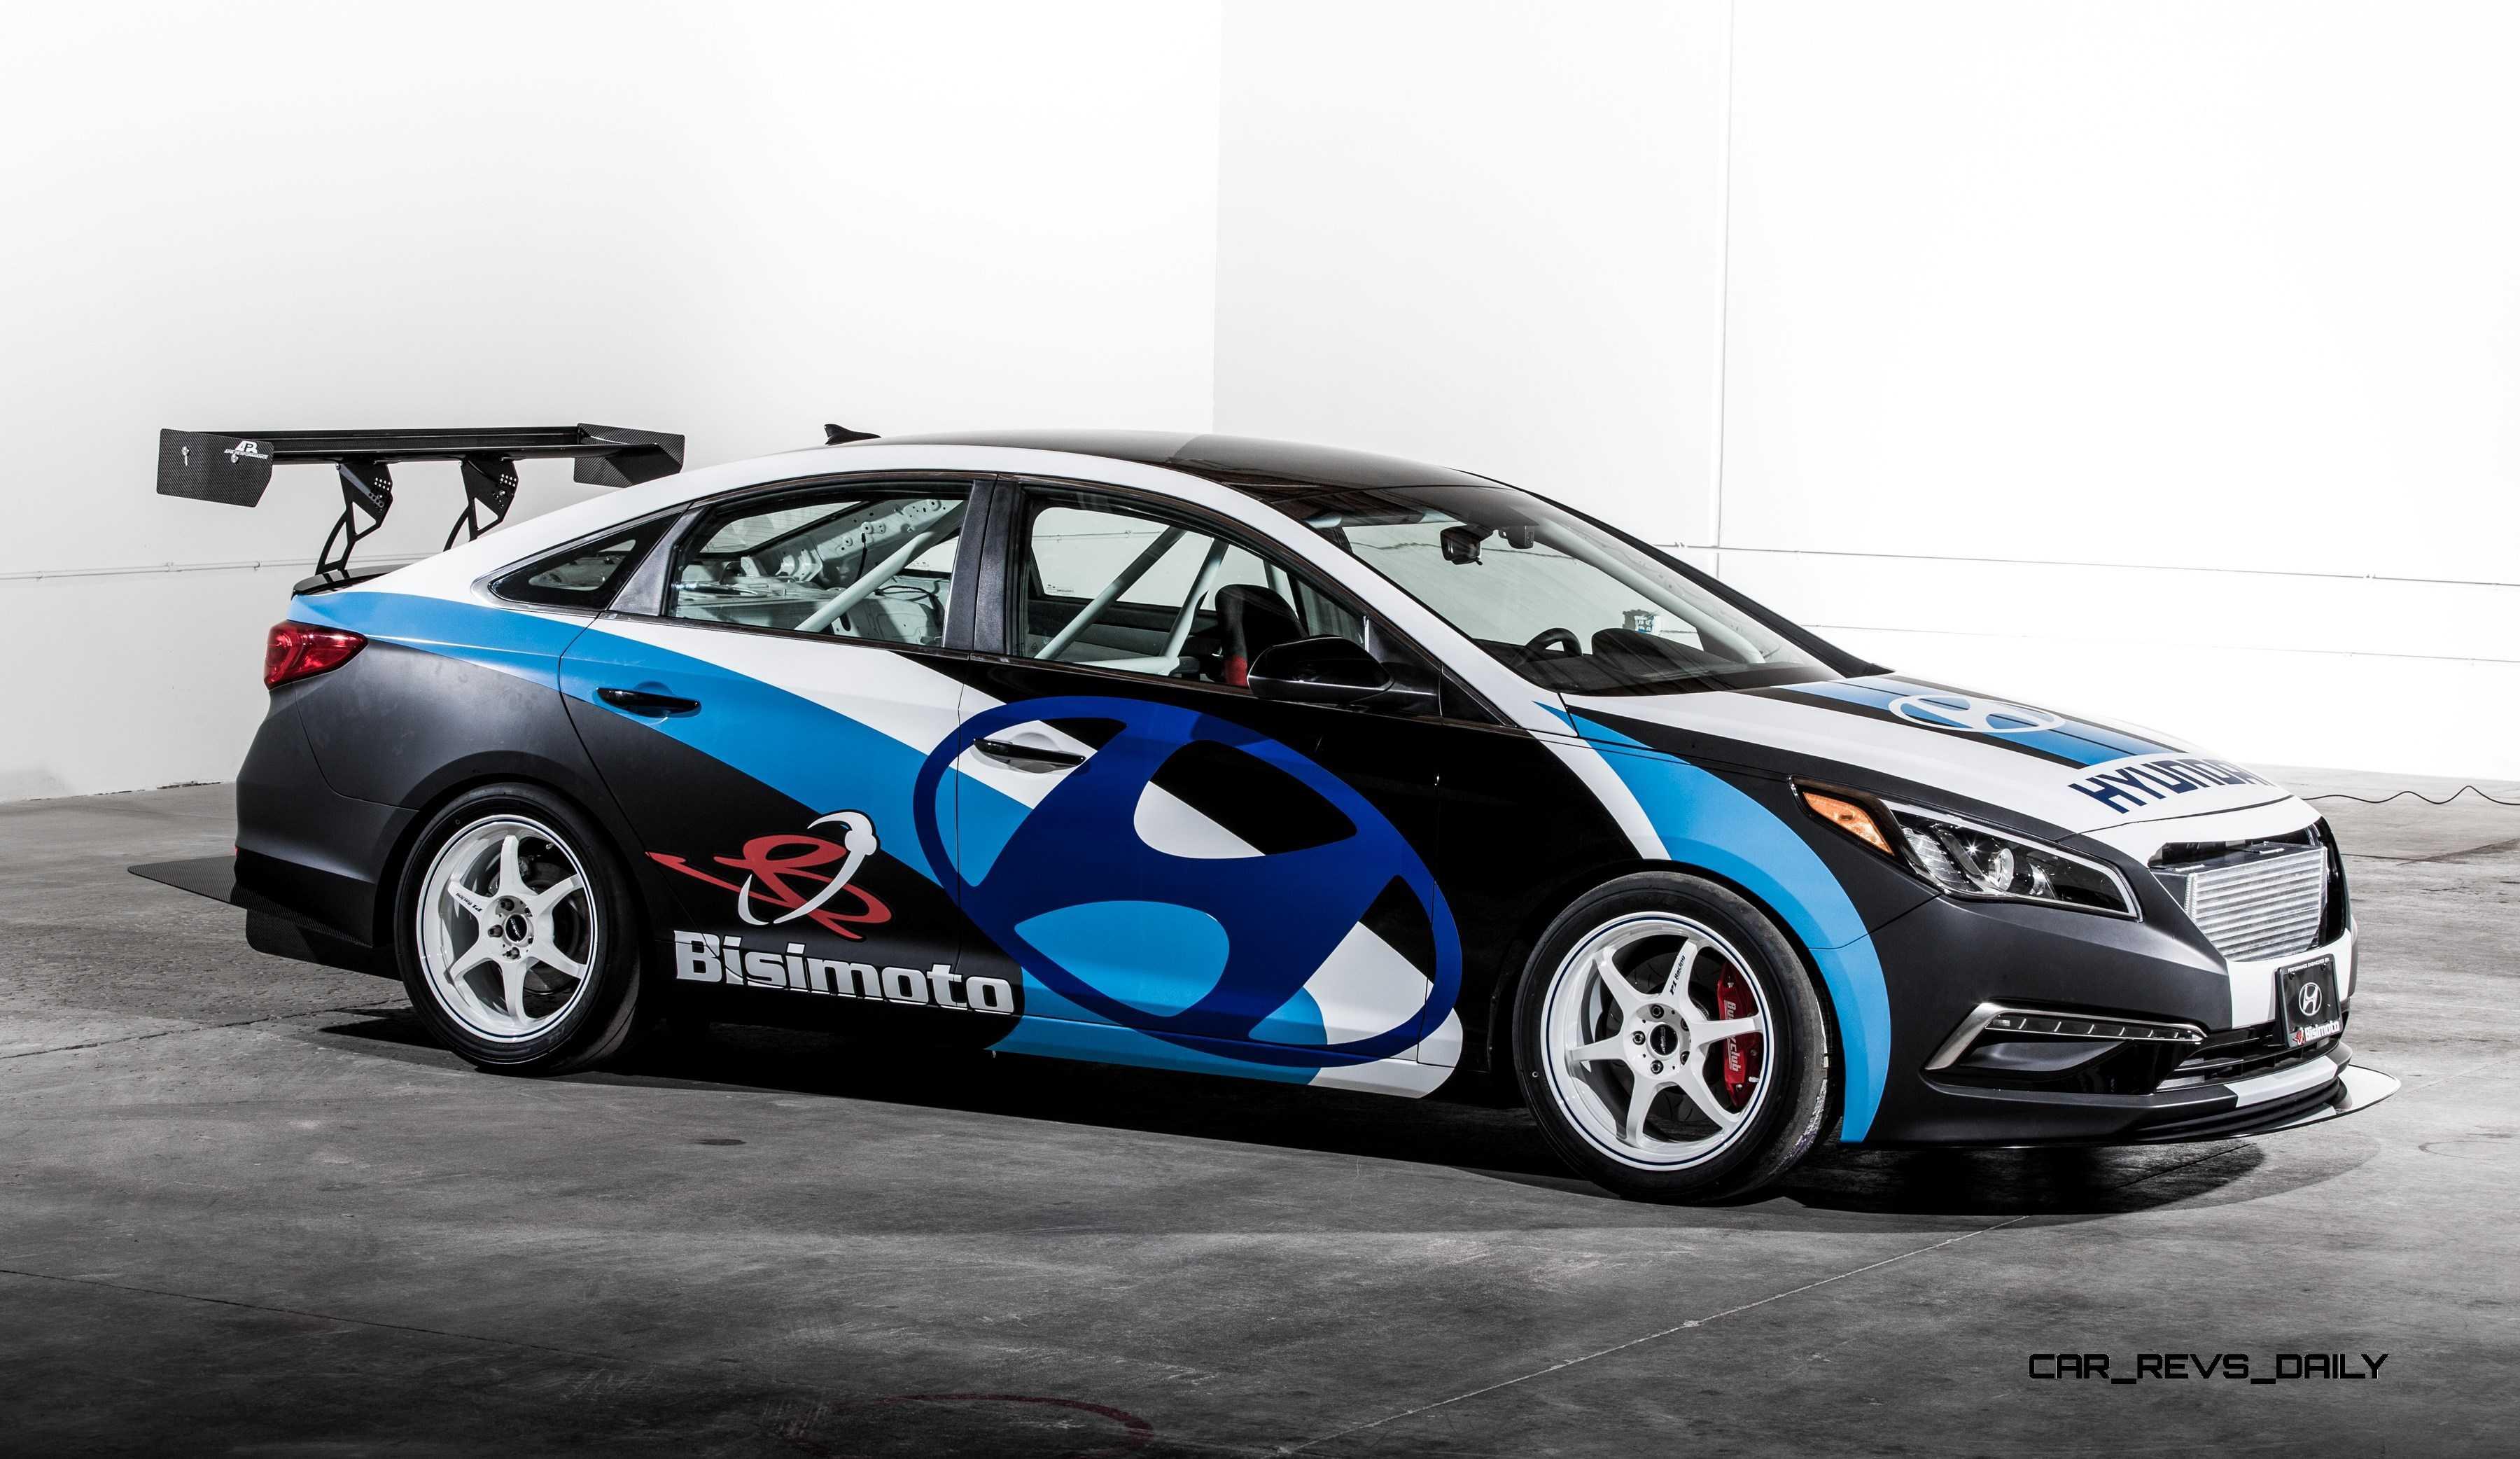 tech elantra updates features brings classy and pricing photos led madison hyundai sedan